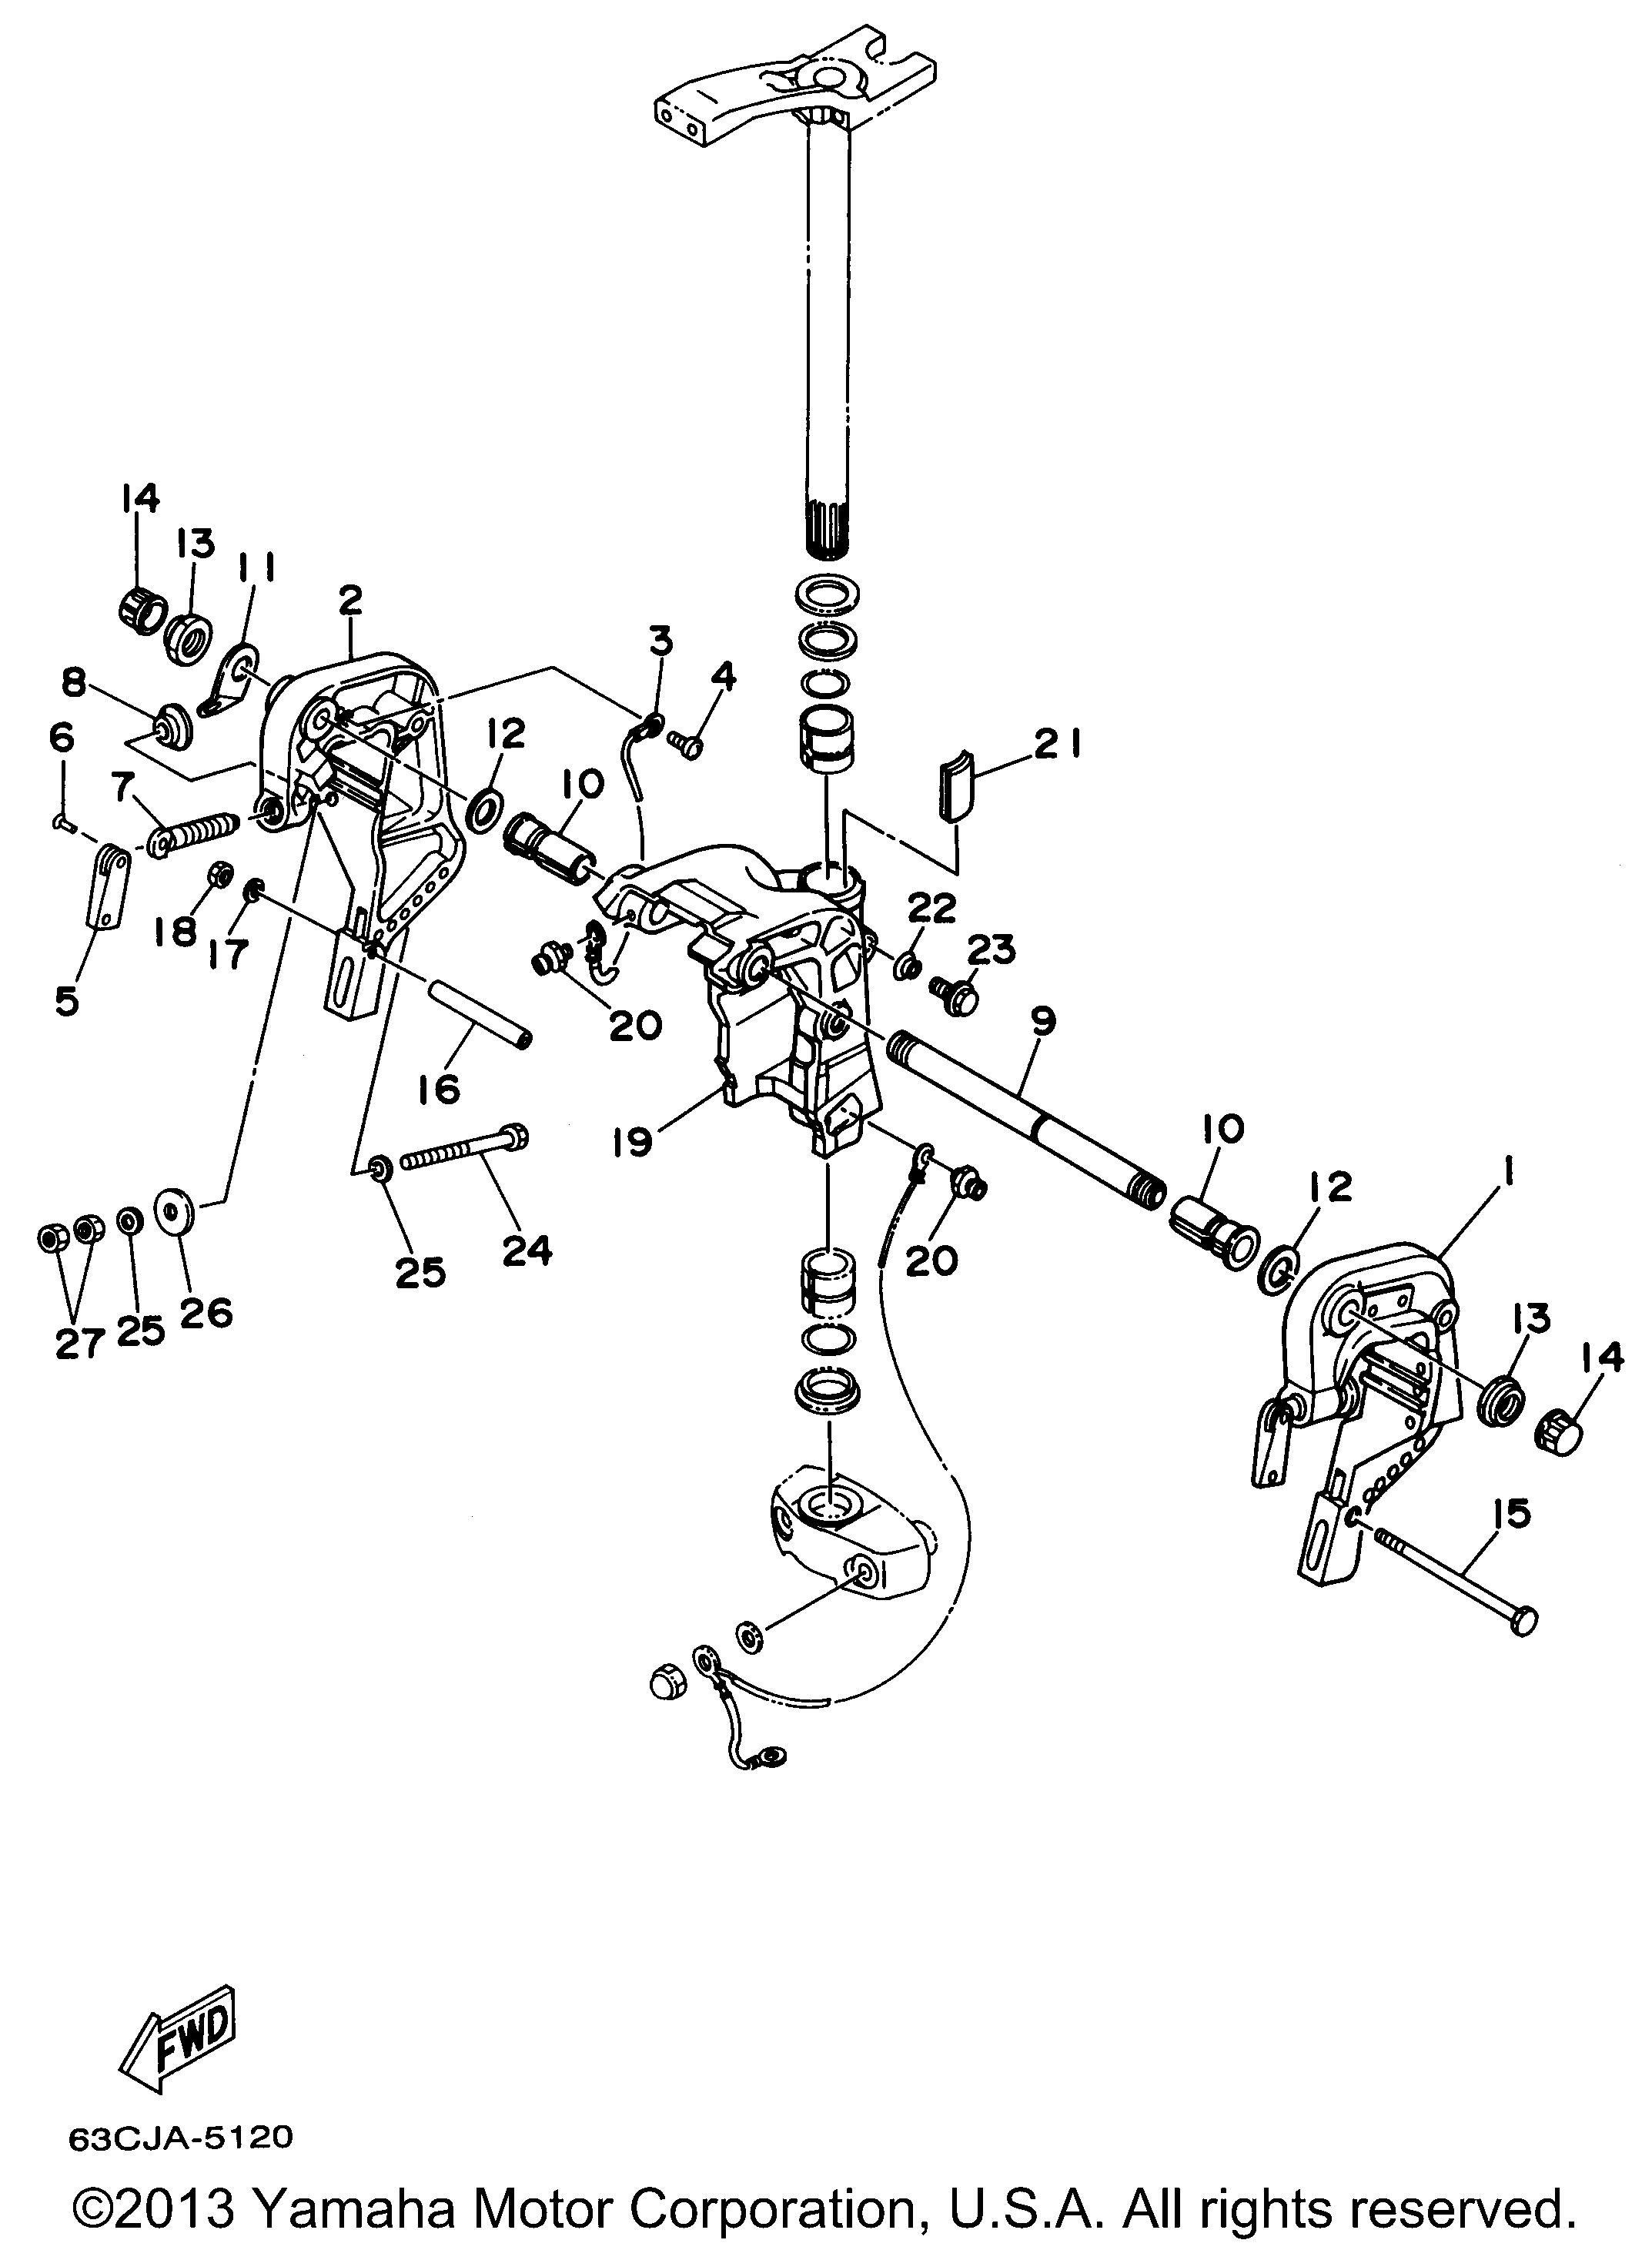 Johnson Remote Control Parts For 1988 90hp J90tlcca Manual Guide